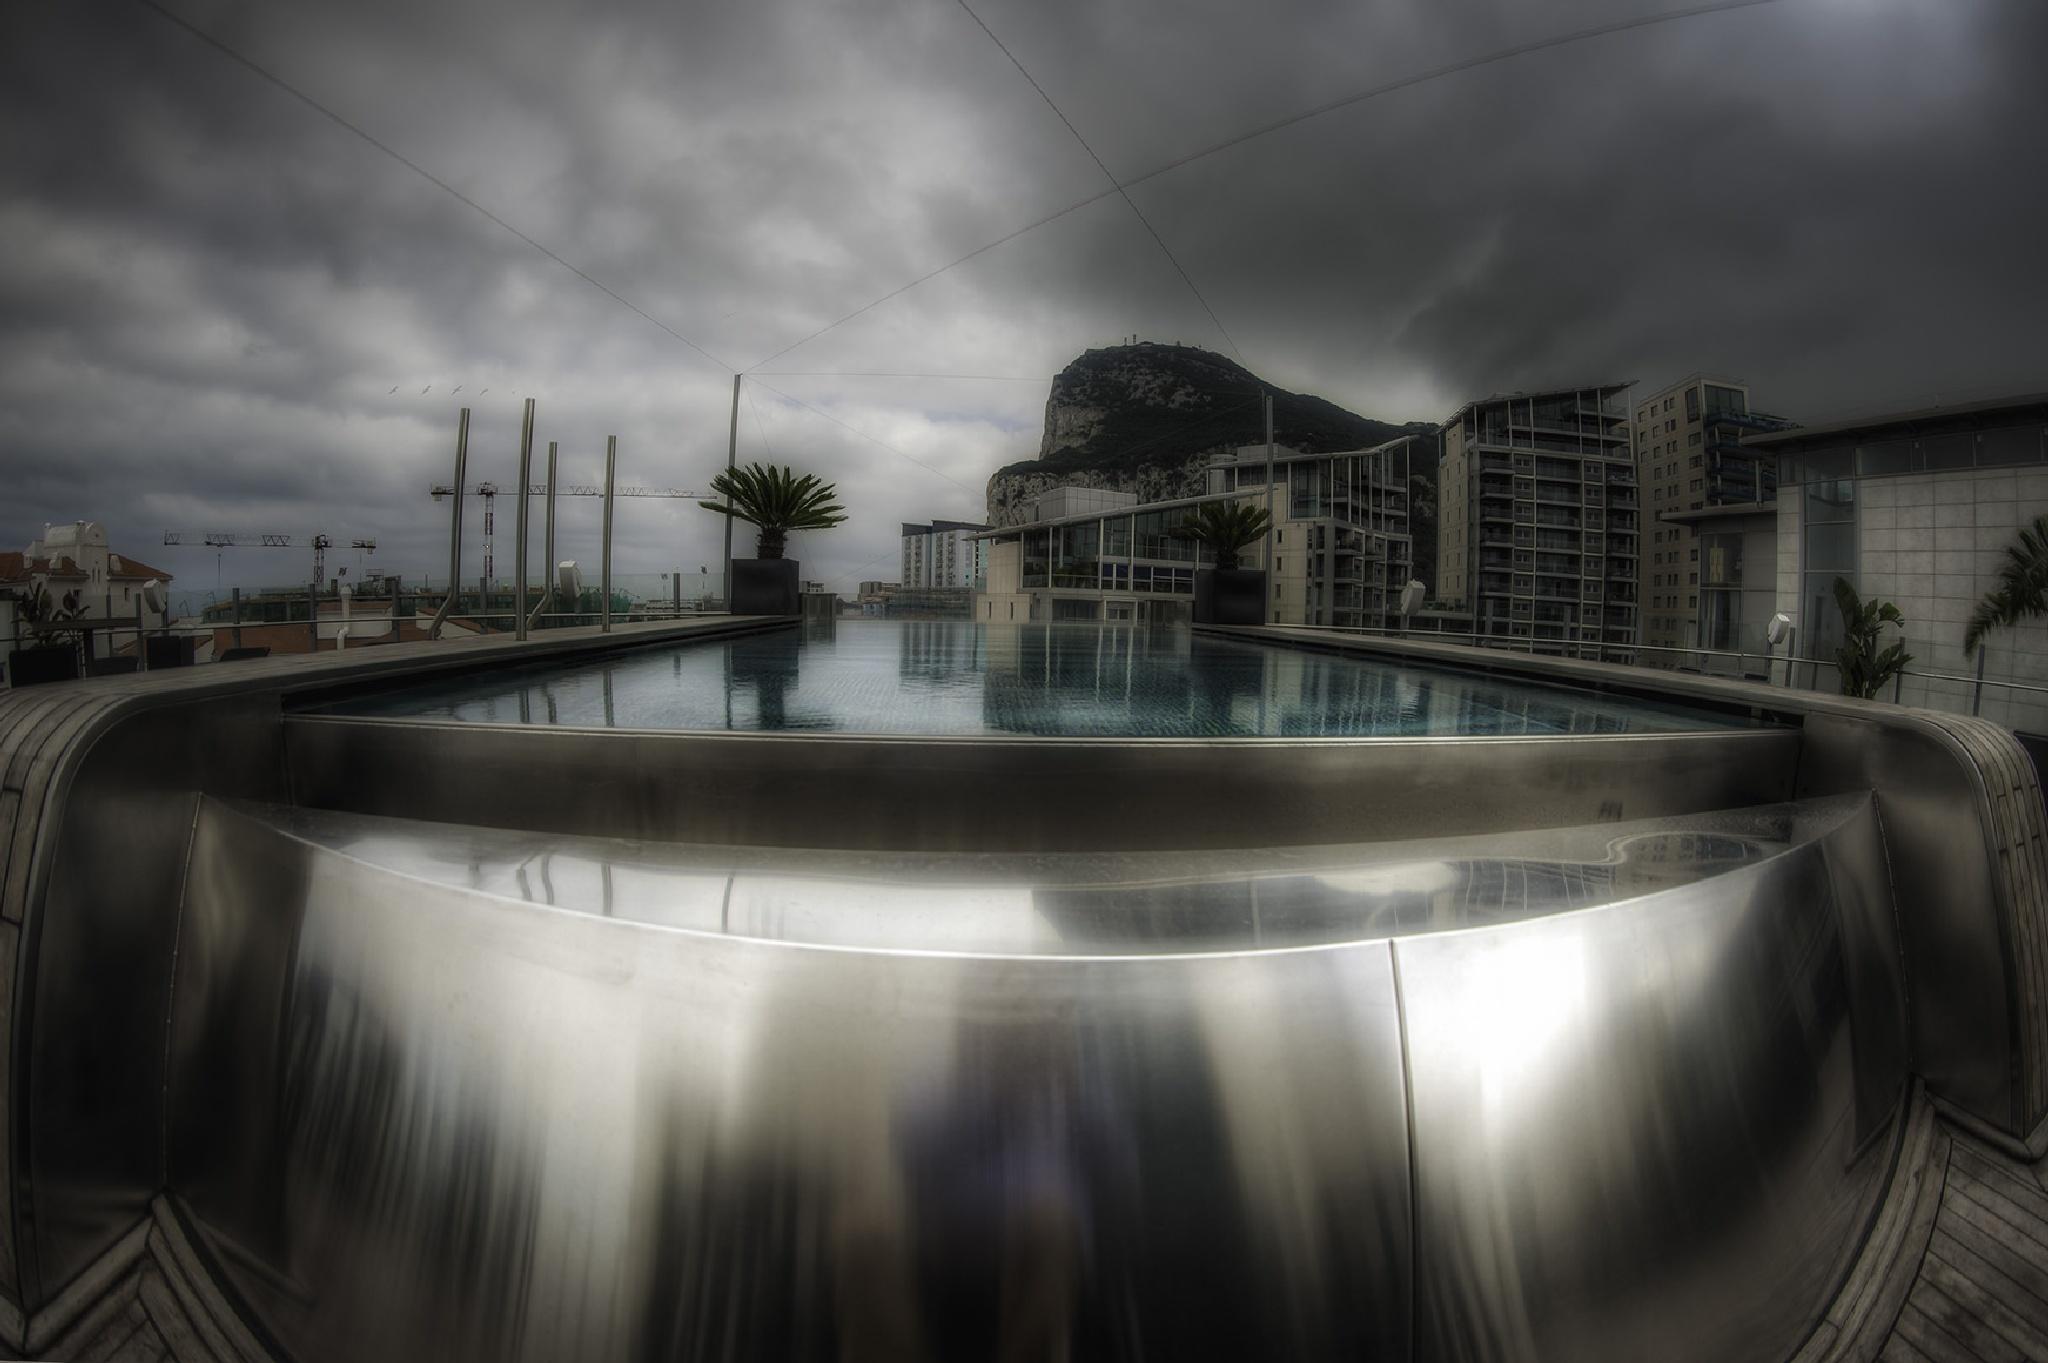 Rock Pool by gibwheels